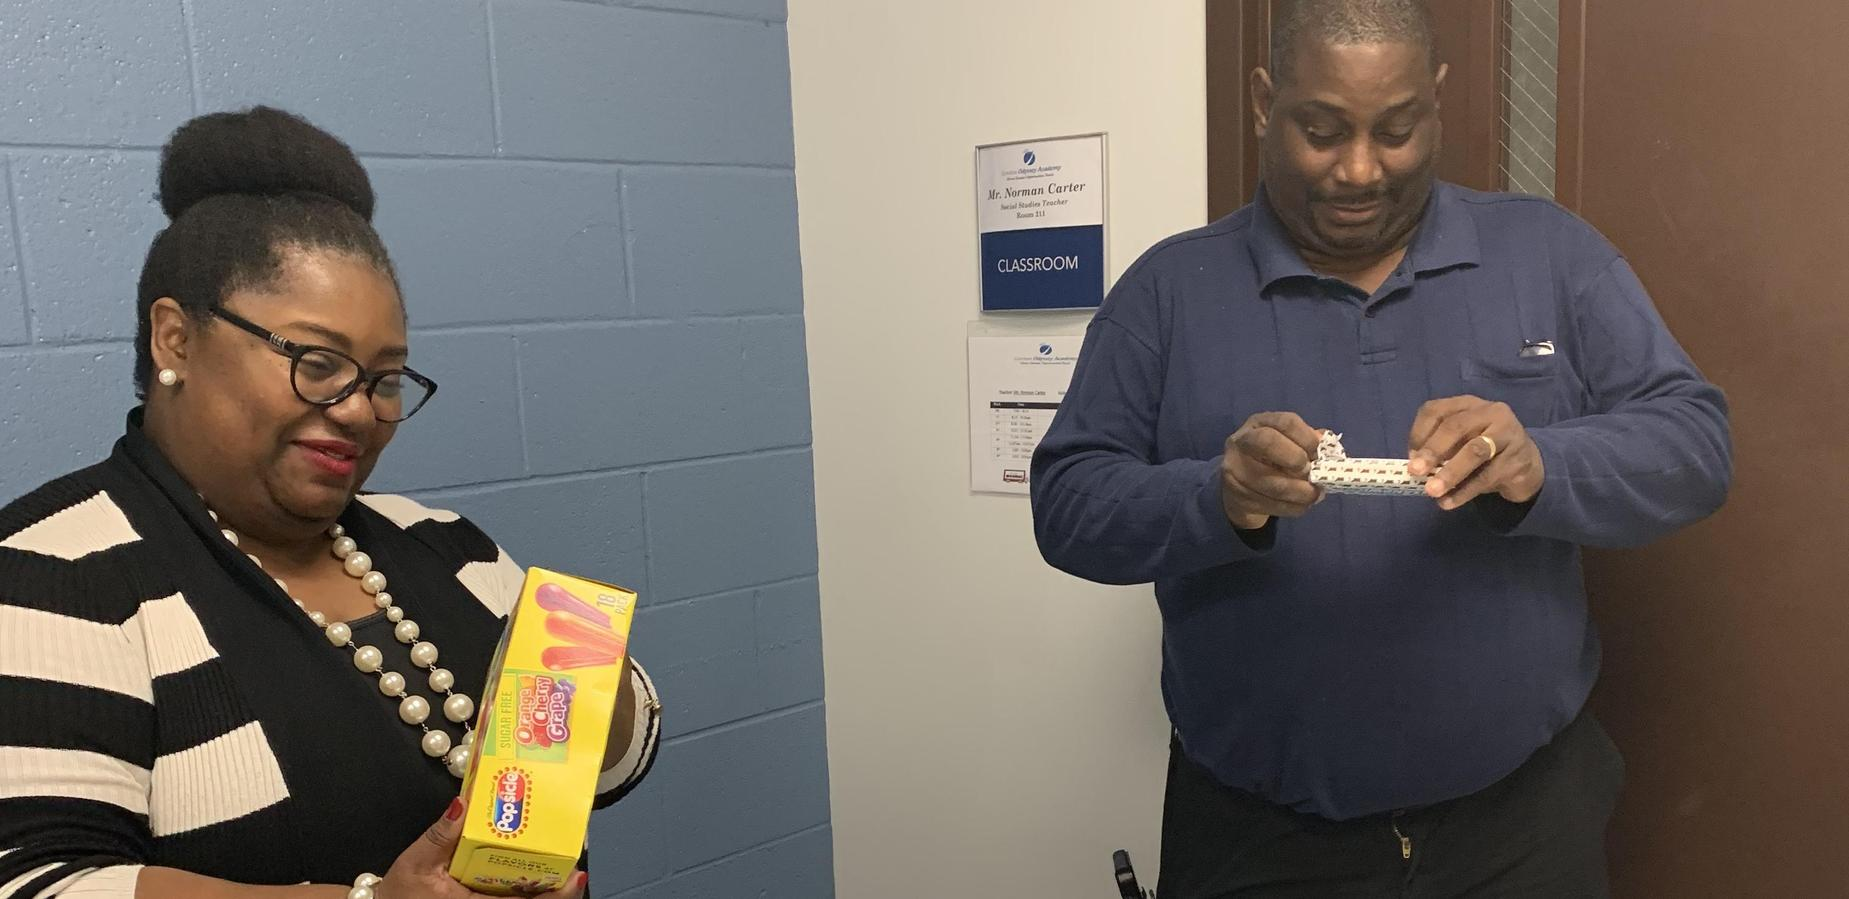 Dr. Tindal honoring Mr. Carter during American Education Week